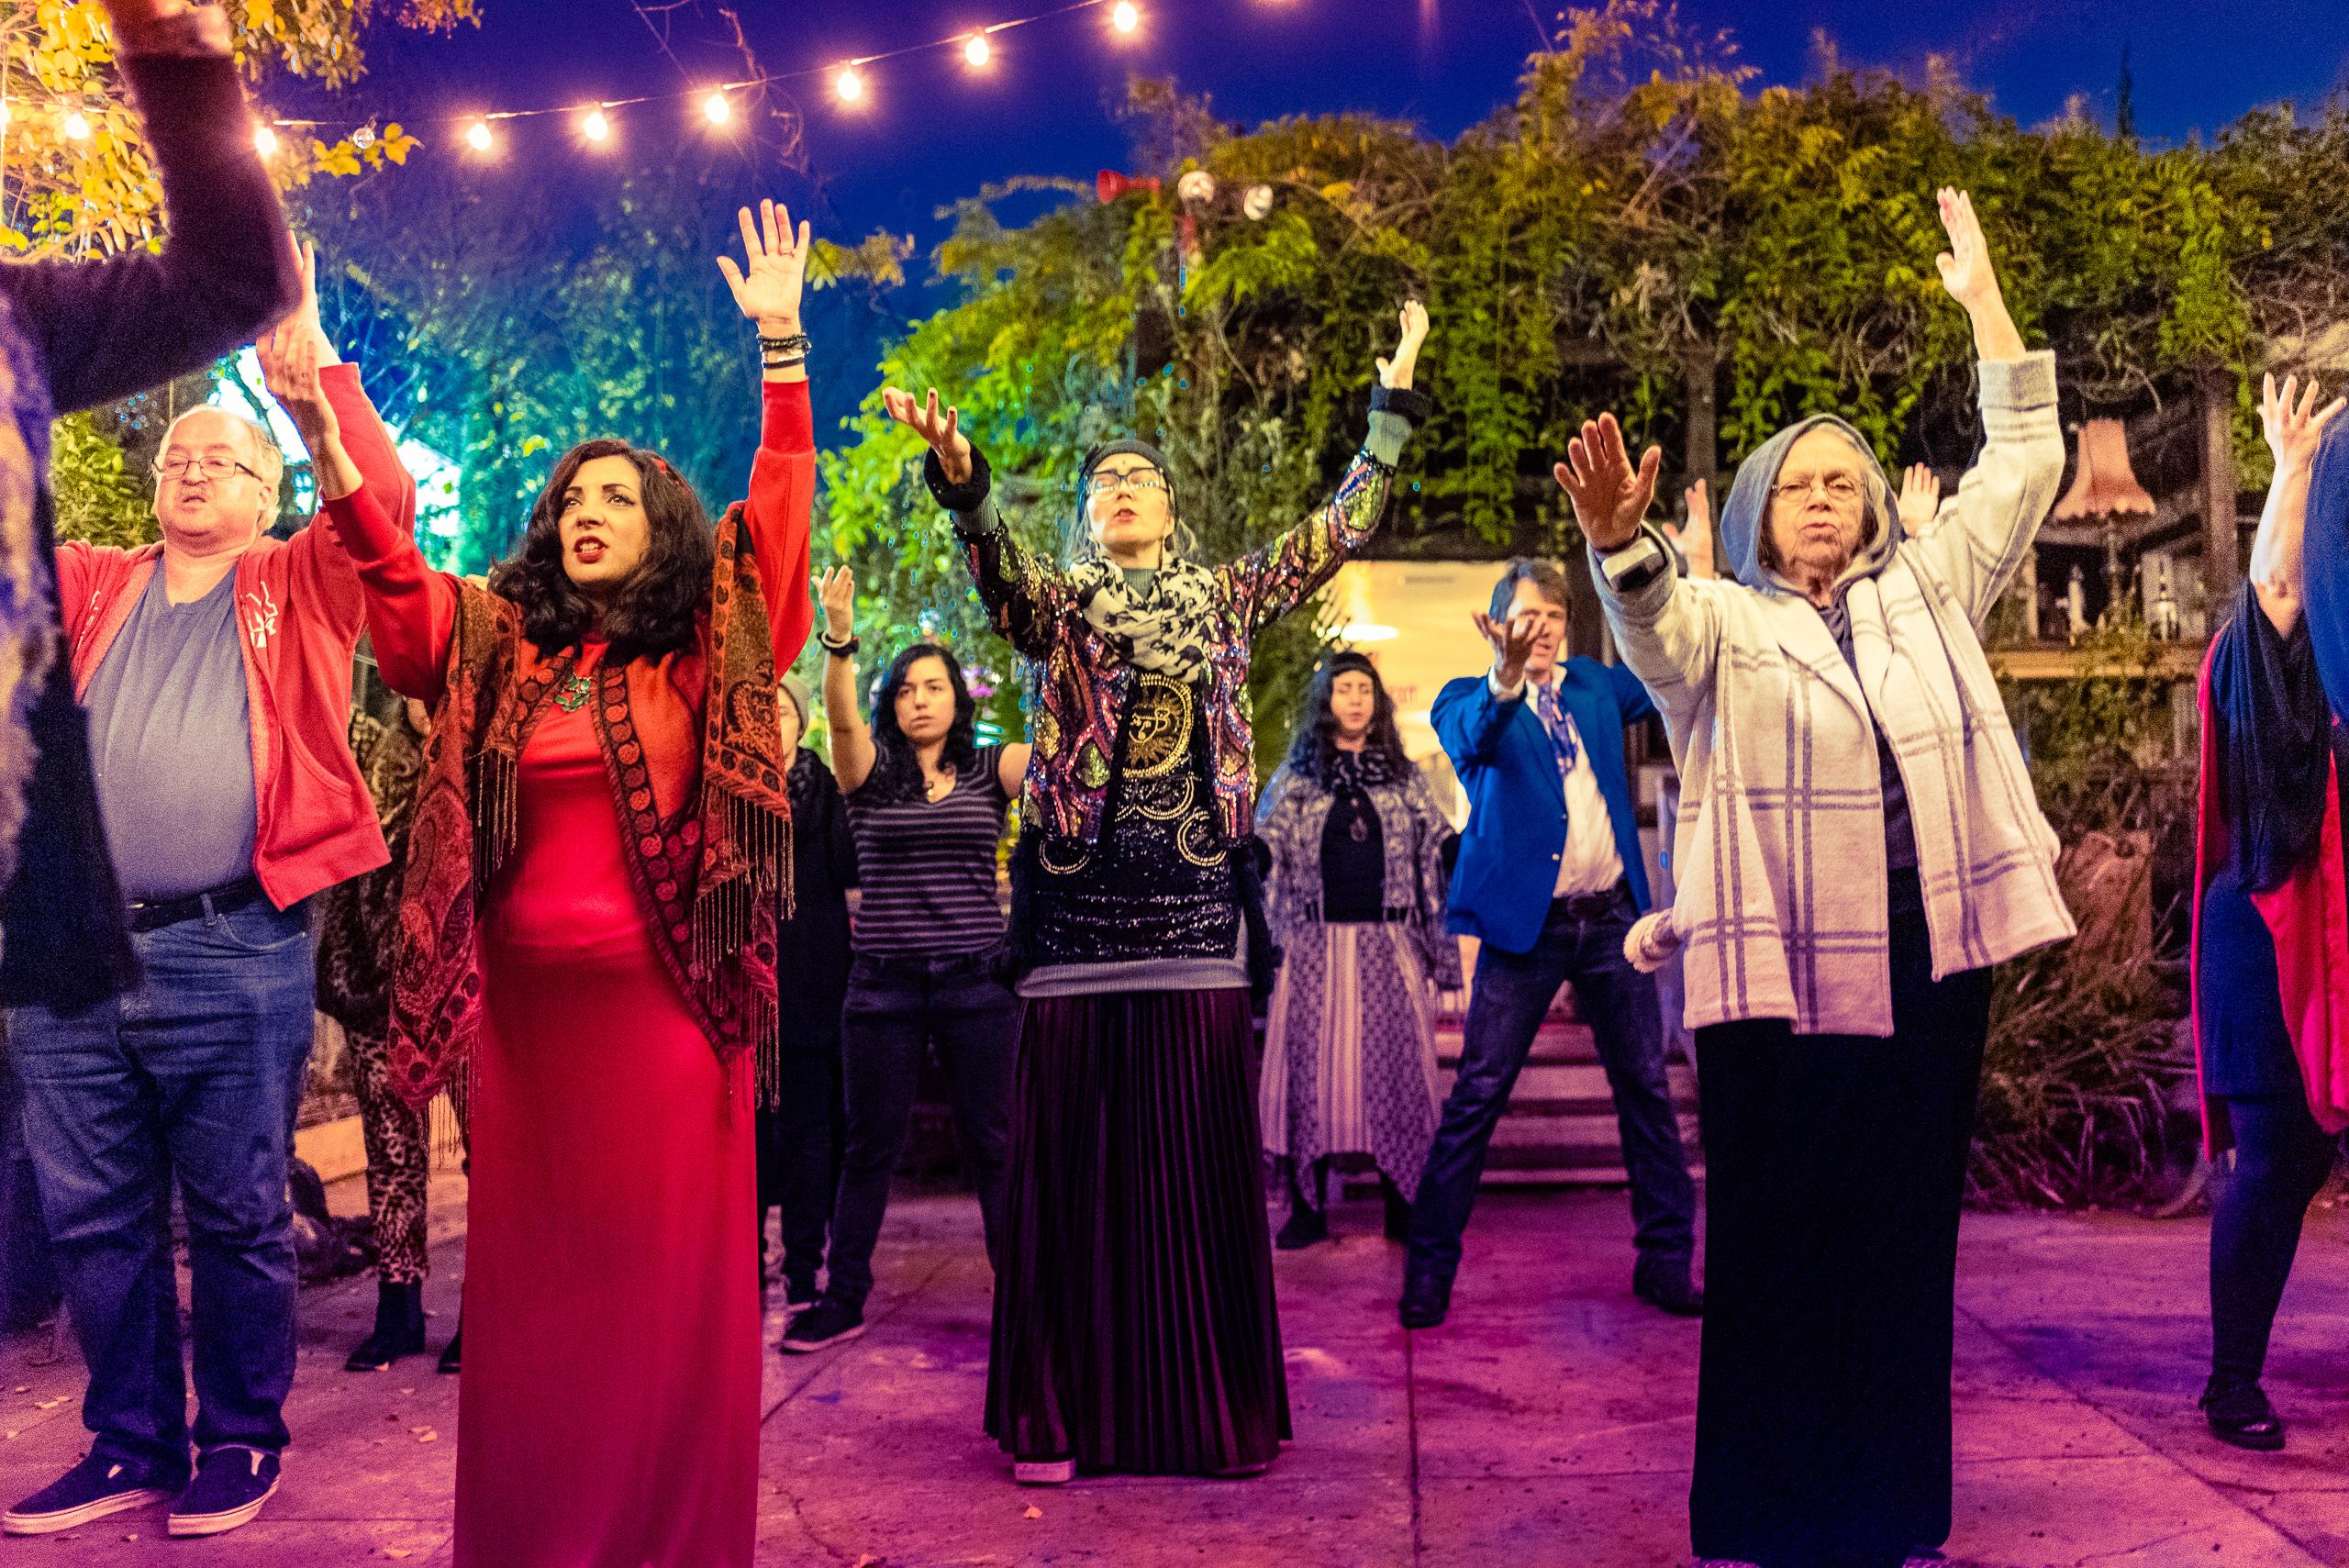 Tarot Society Holiday Solstice Party @ Mi Alma Designs, 708 N. Wilton Place, Hollywood, CA